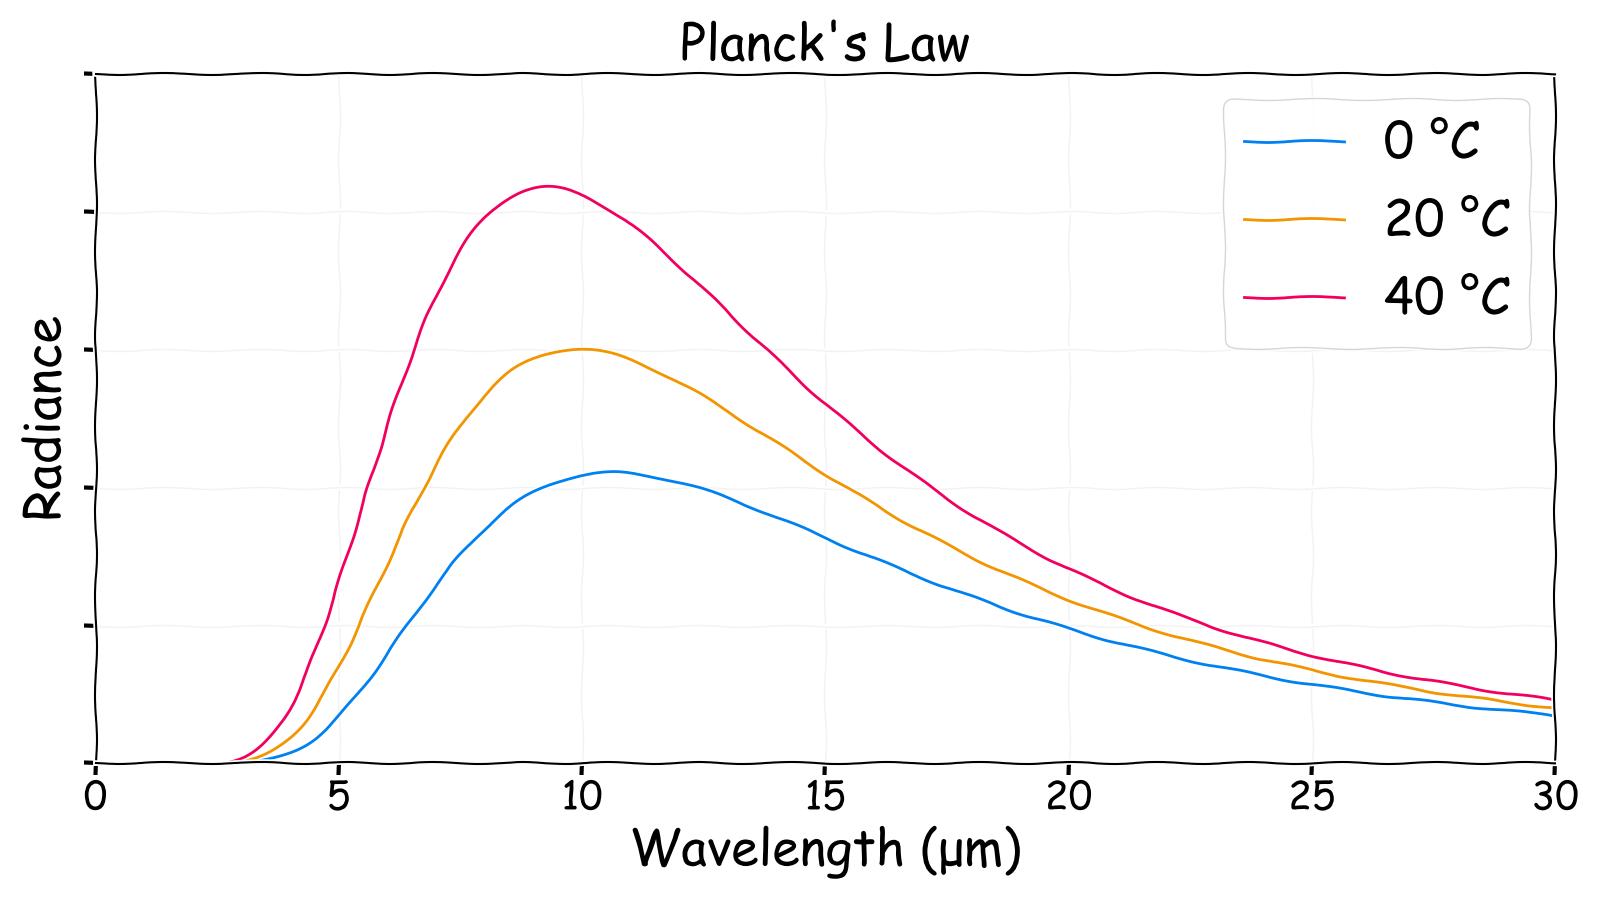 Planck's Law